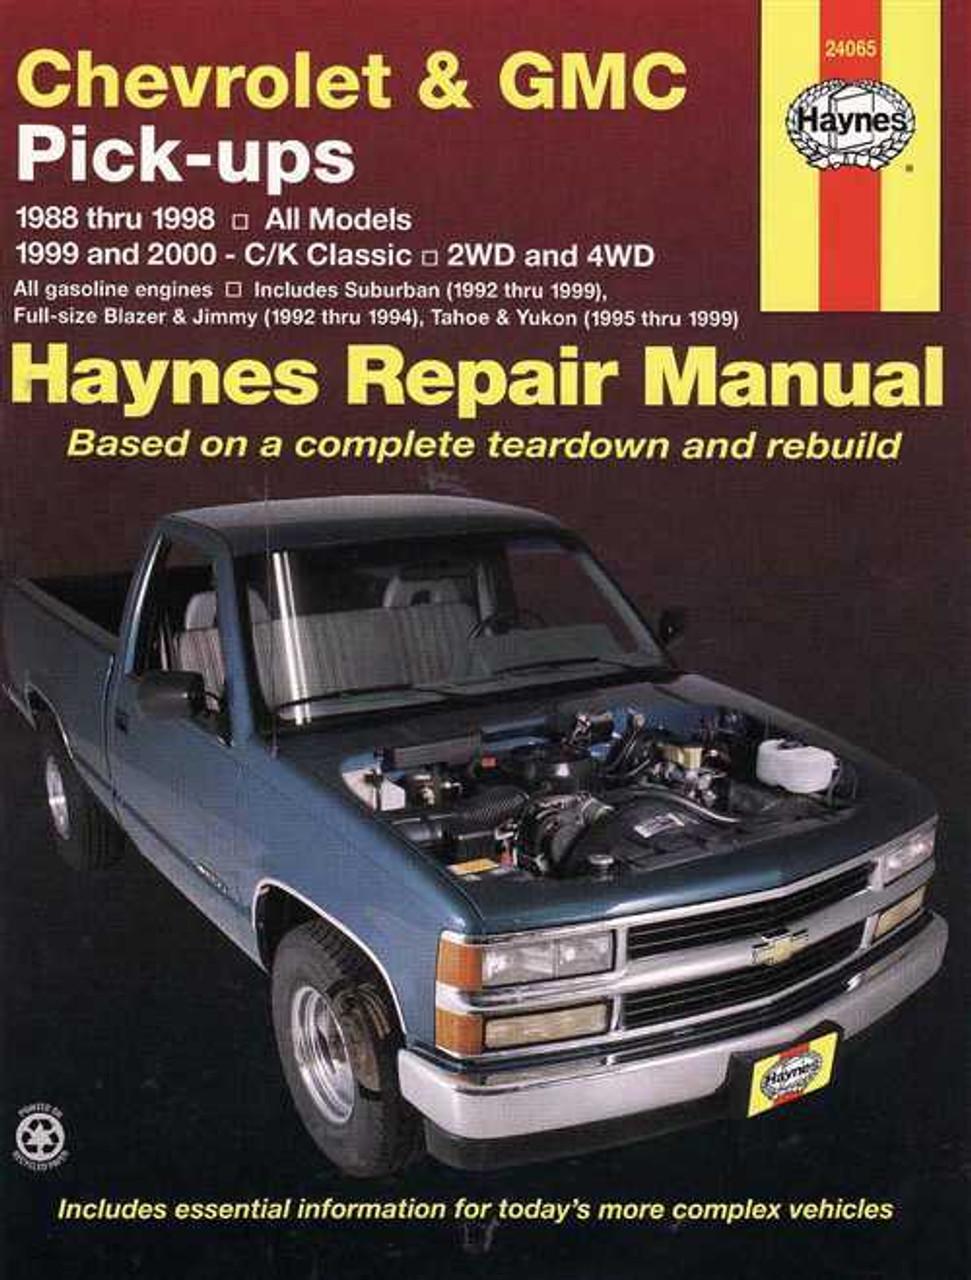 chevrolet amp gmc pick ups 1988 2000 workshop manual rh automotobookshop com au 2004 Chevrolet Blazer 2006 Chevrolet Blazer